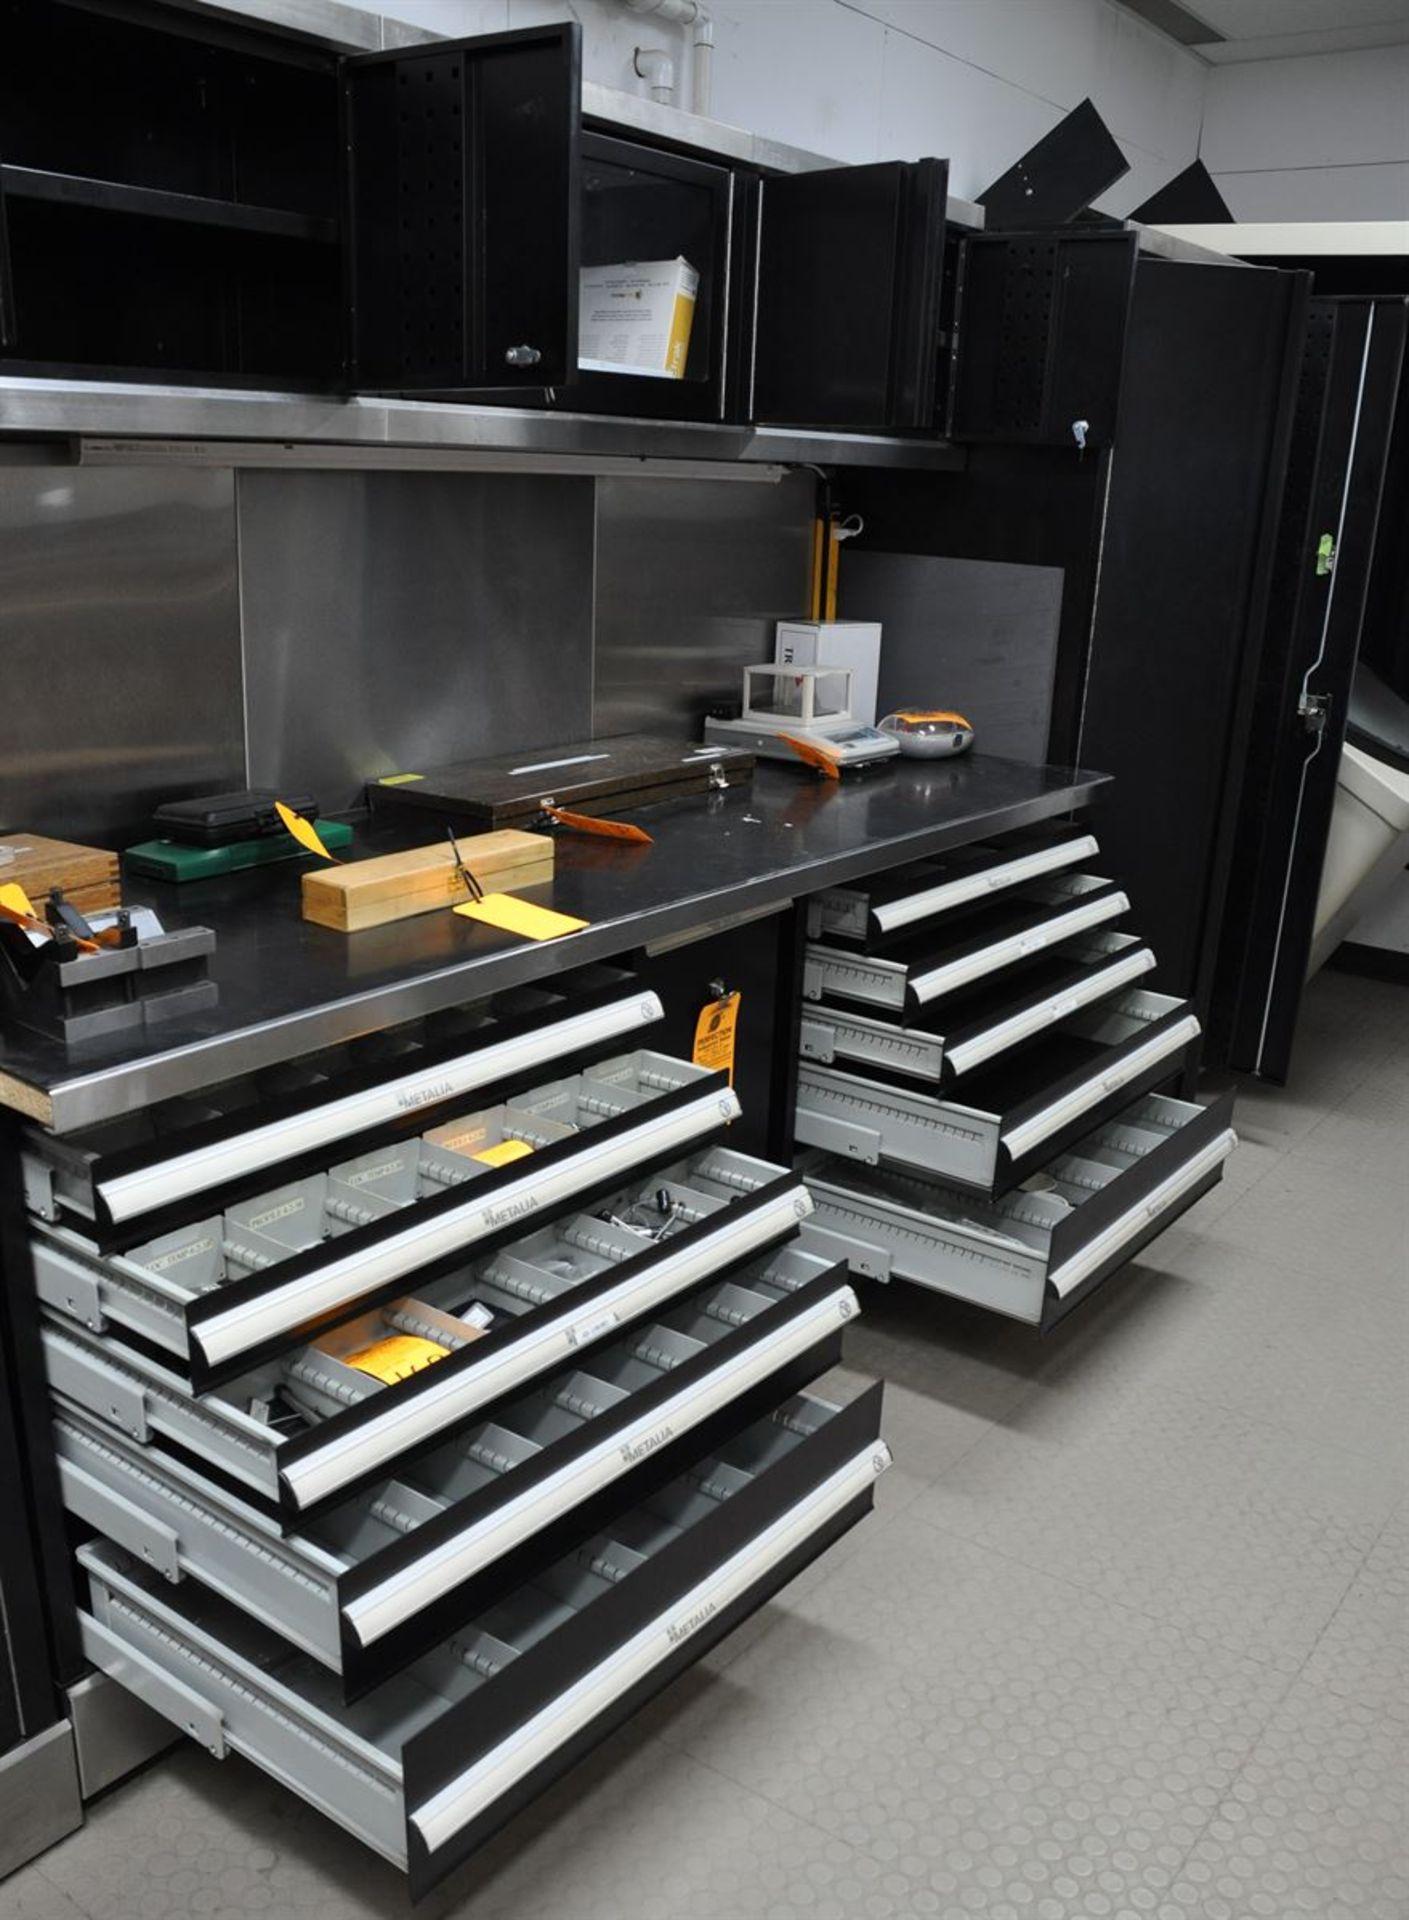 METALIA Work Bench Center - Image 2 of 2